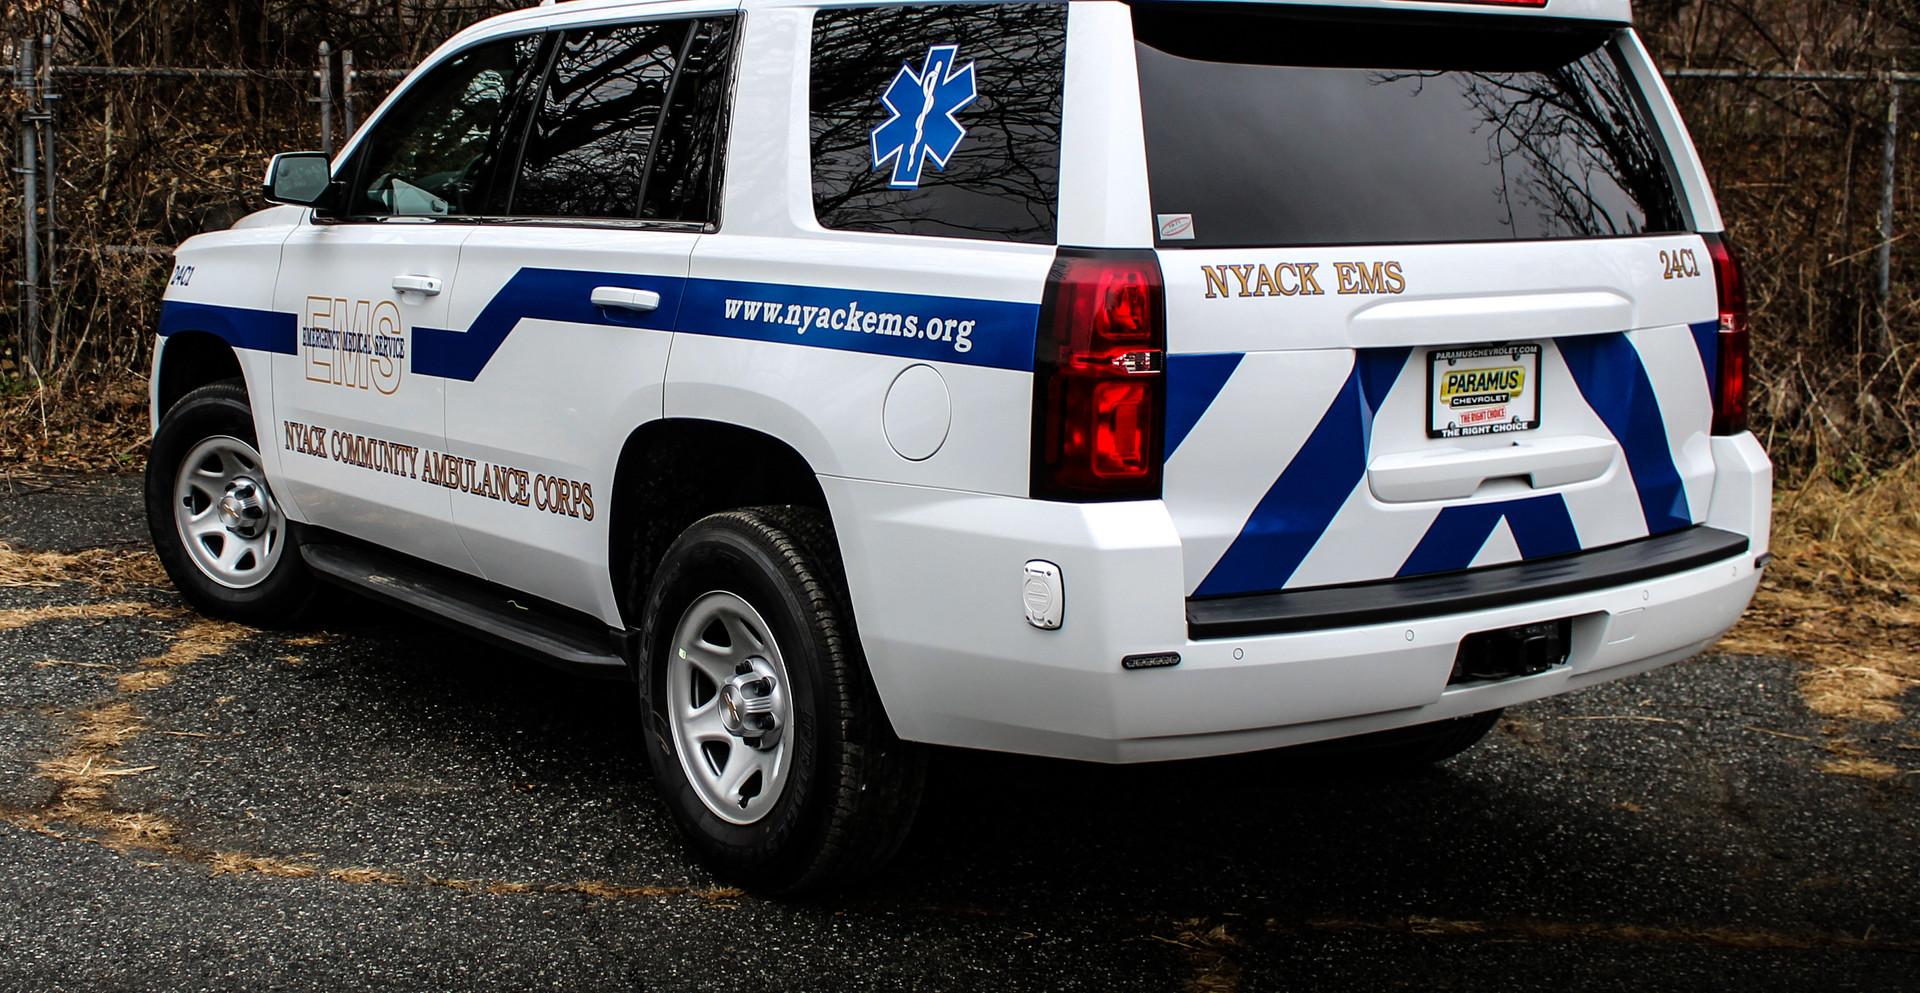 2019 Tahoe EMS Response Unit